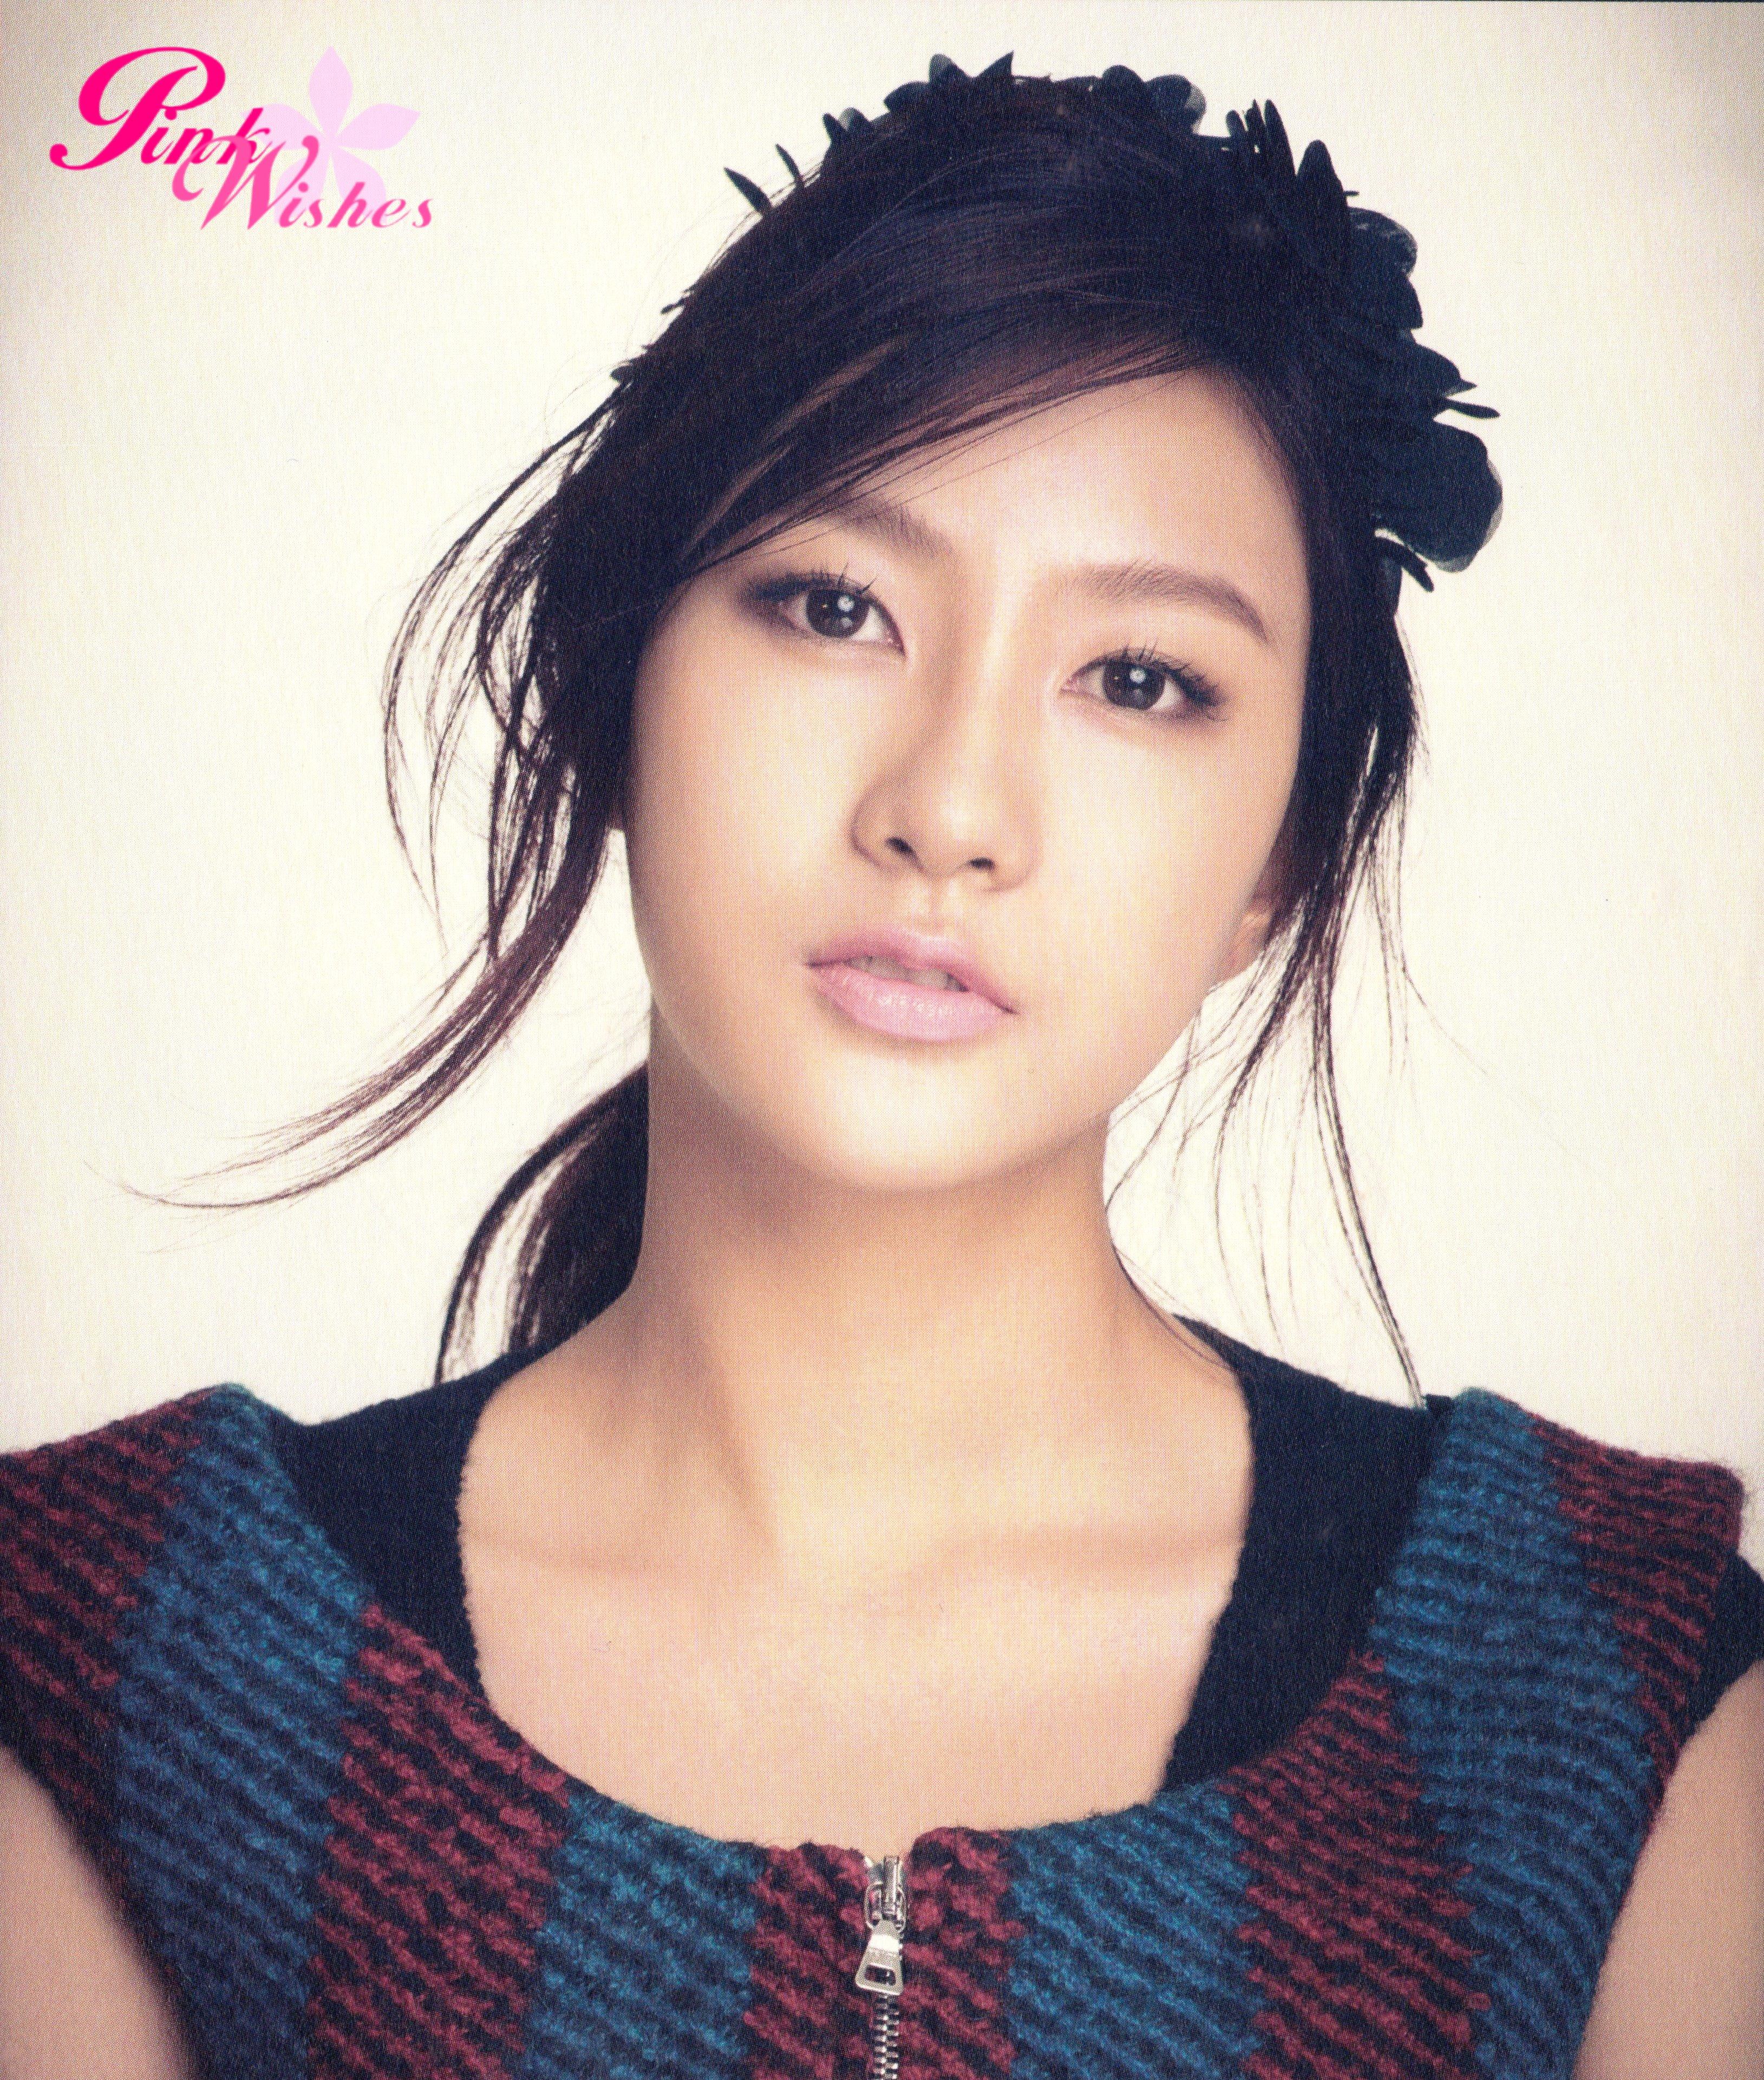 I ♥ A Pink: [Photos] Oh Ha Young